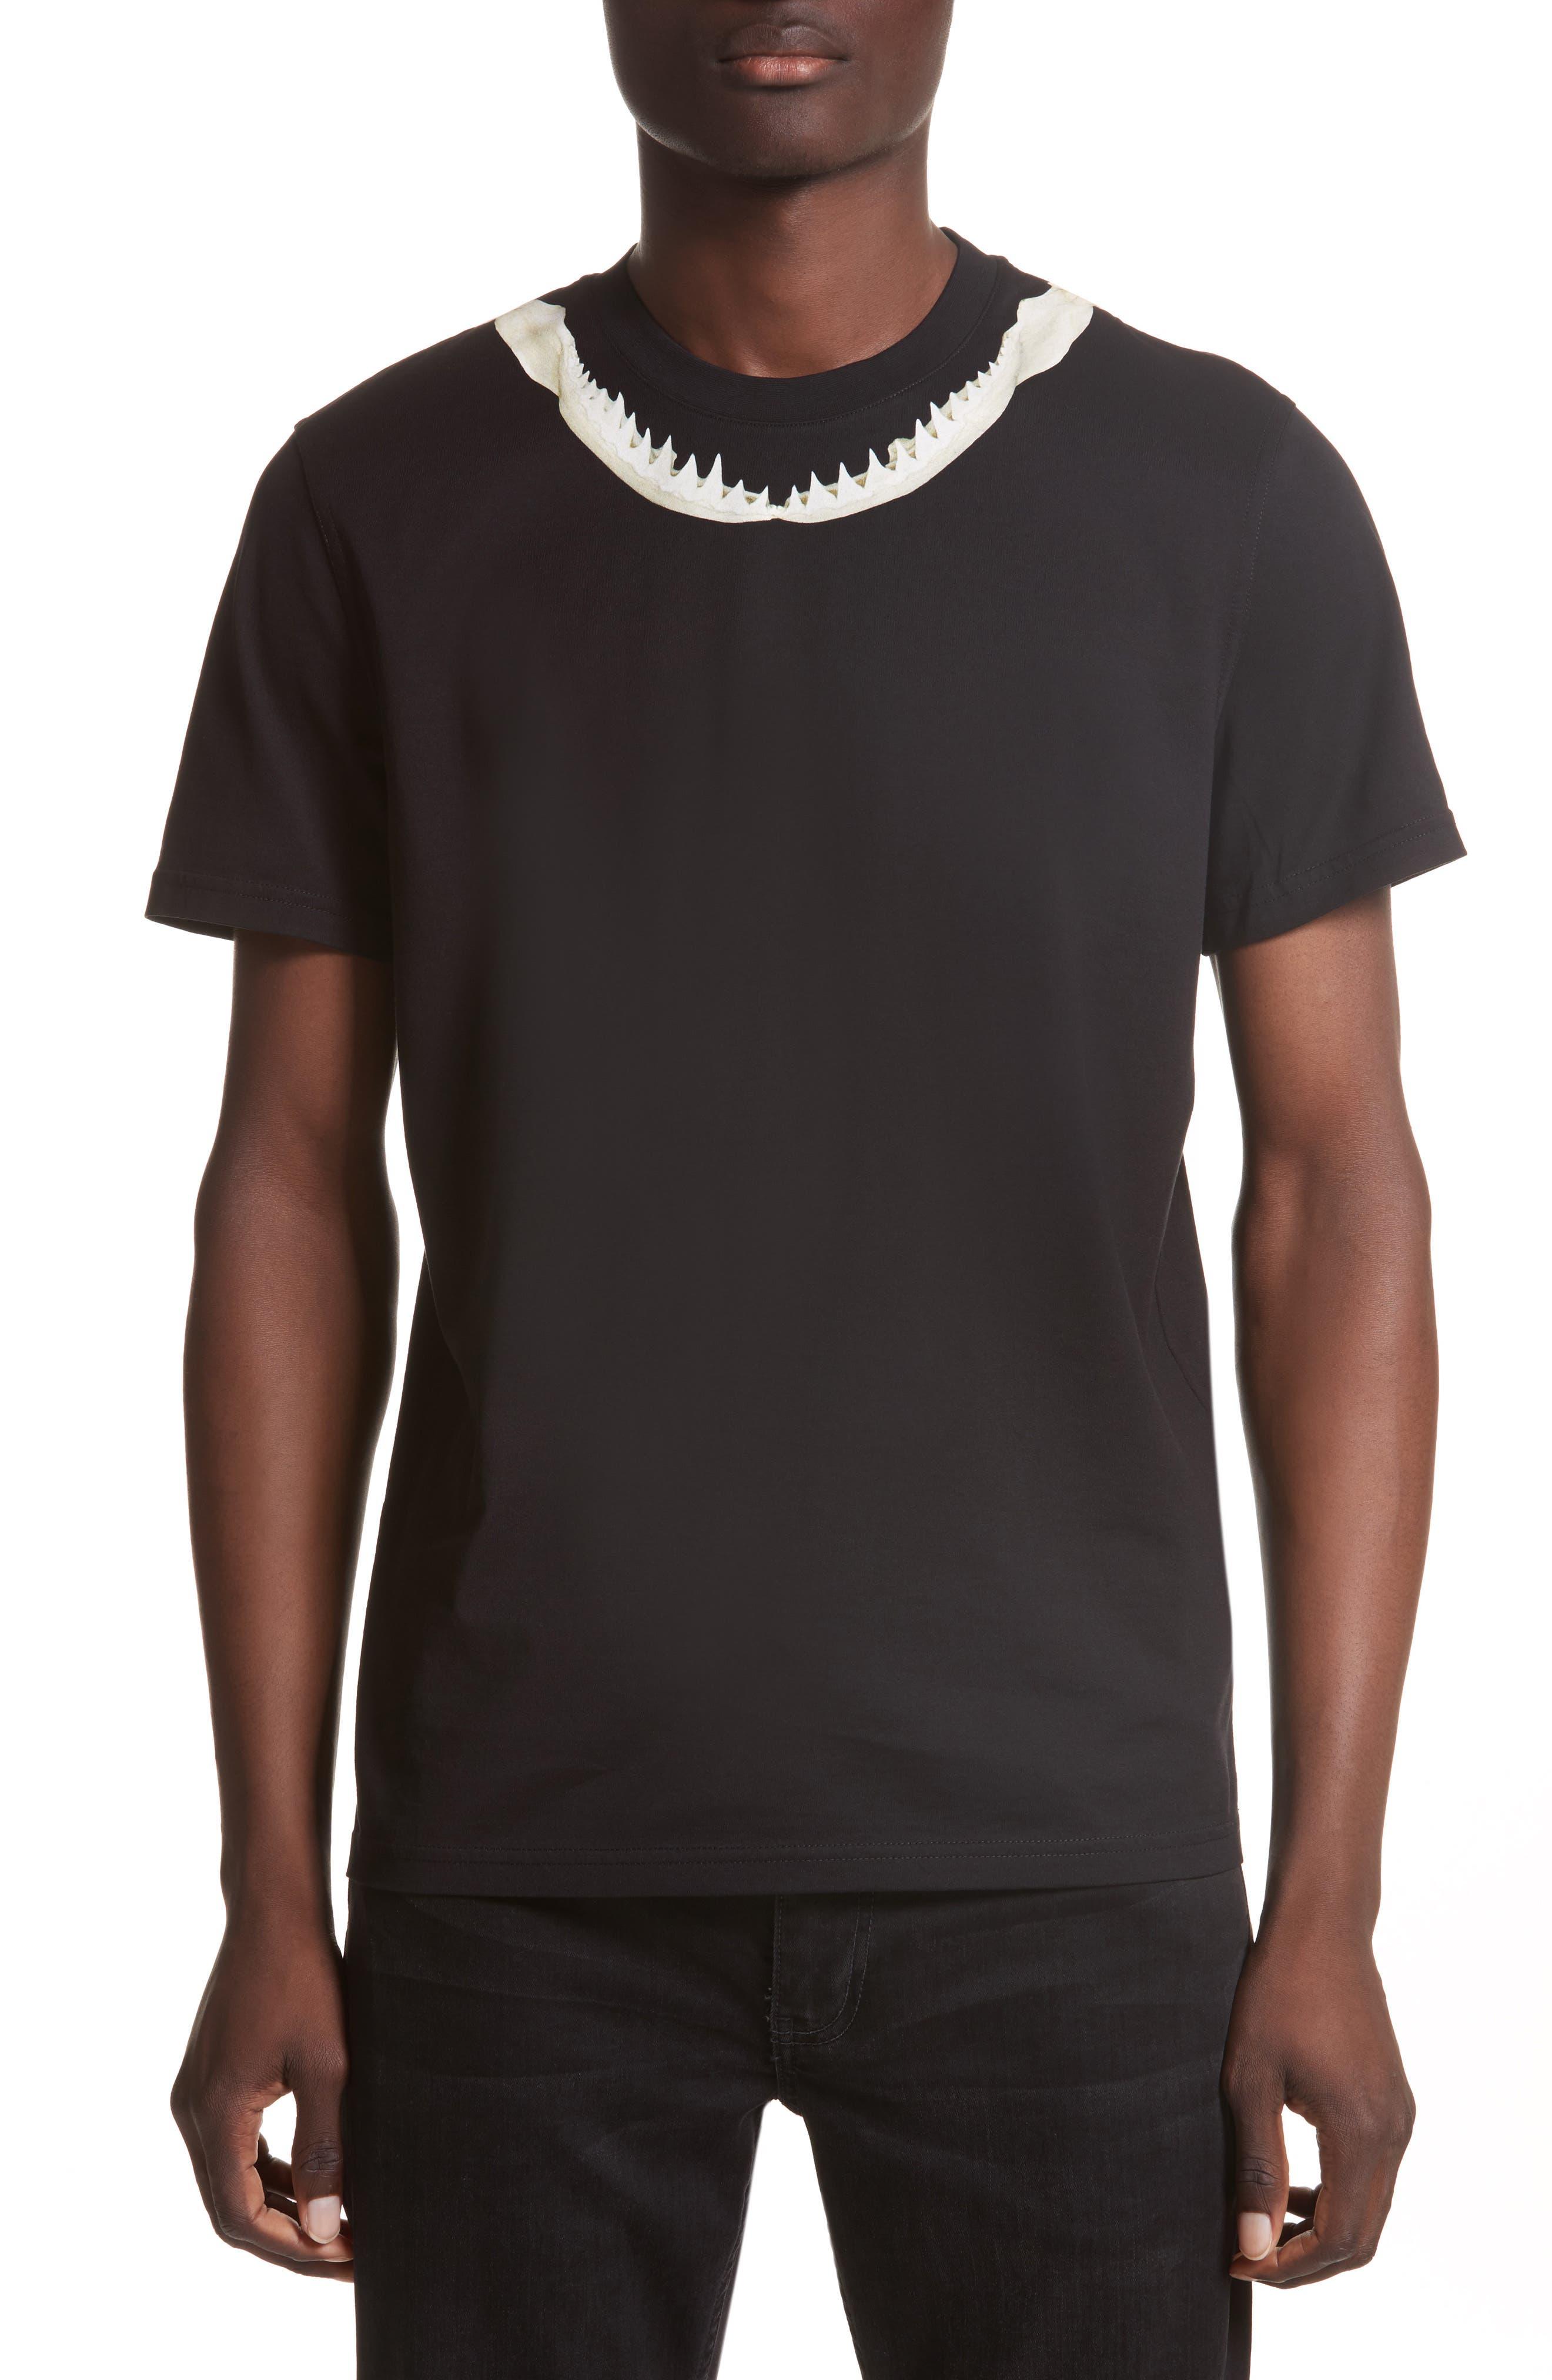 Givenchy Cuban Fit Shark Print T-Shirt